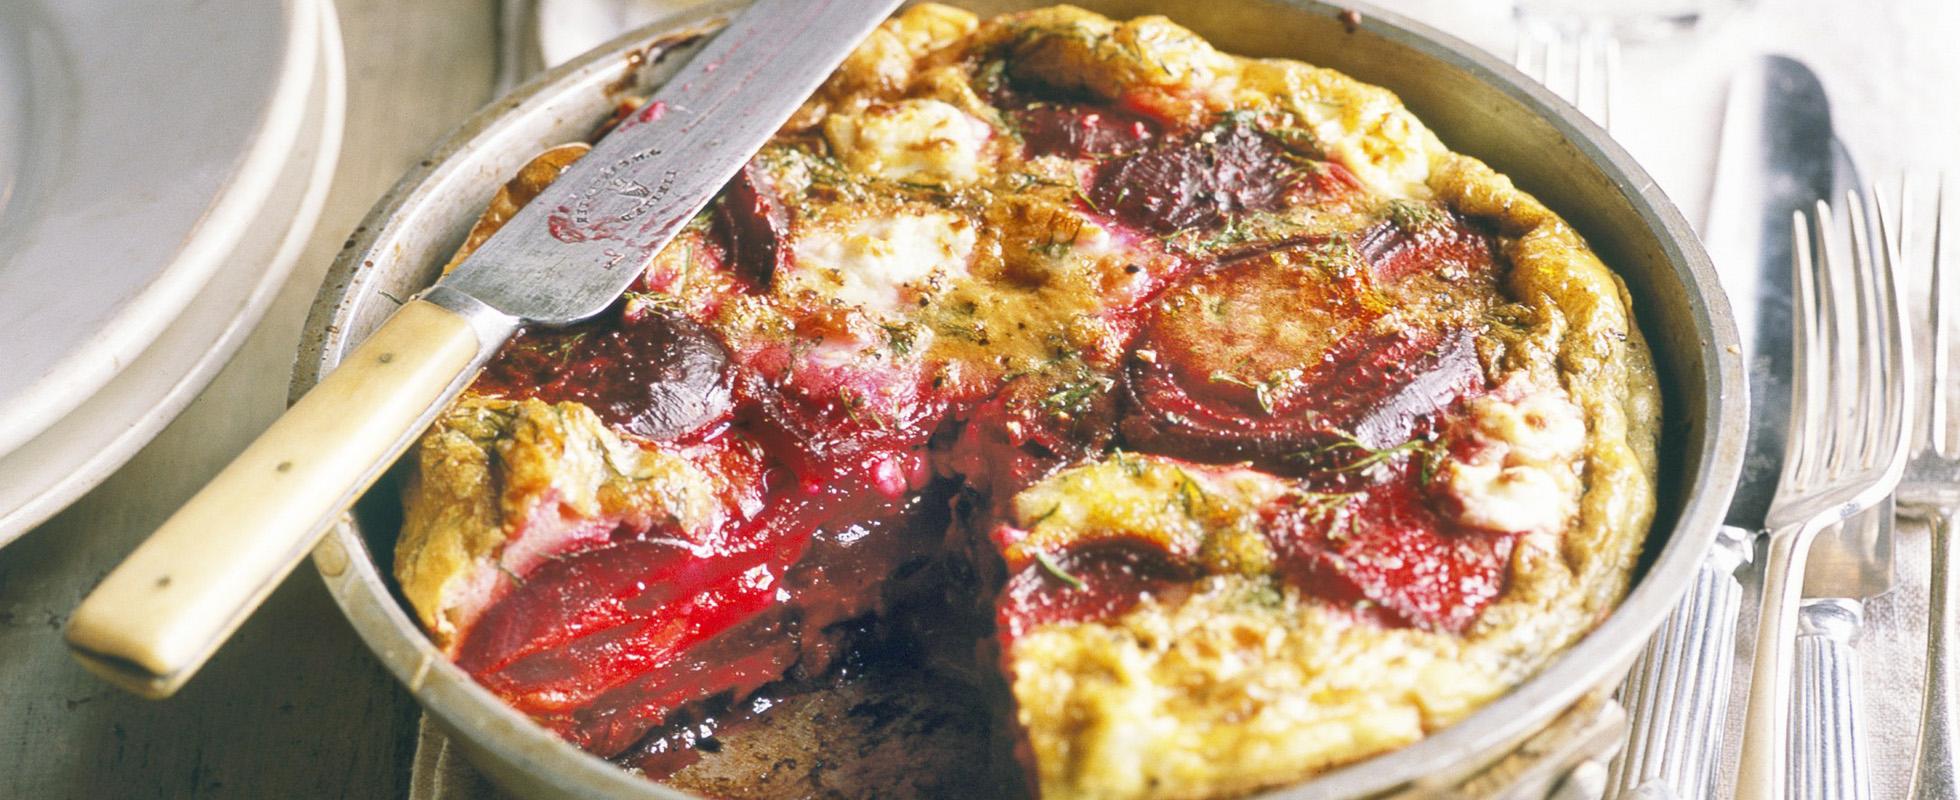 Beetroot, dill and feta frittata